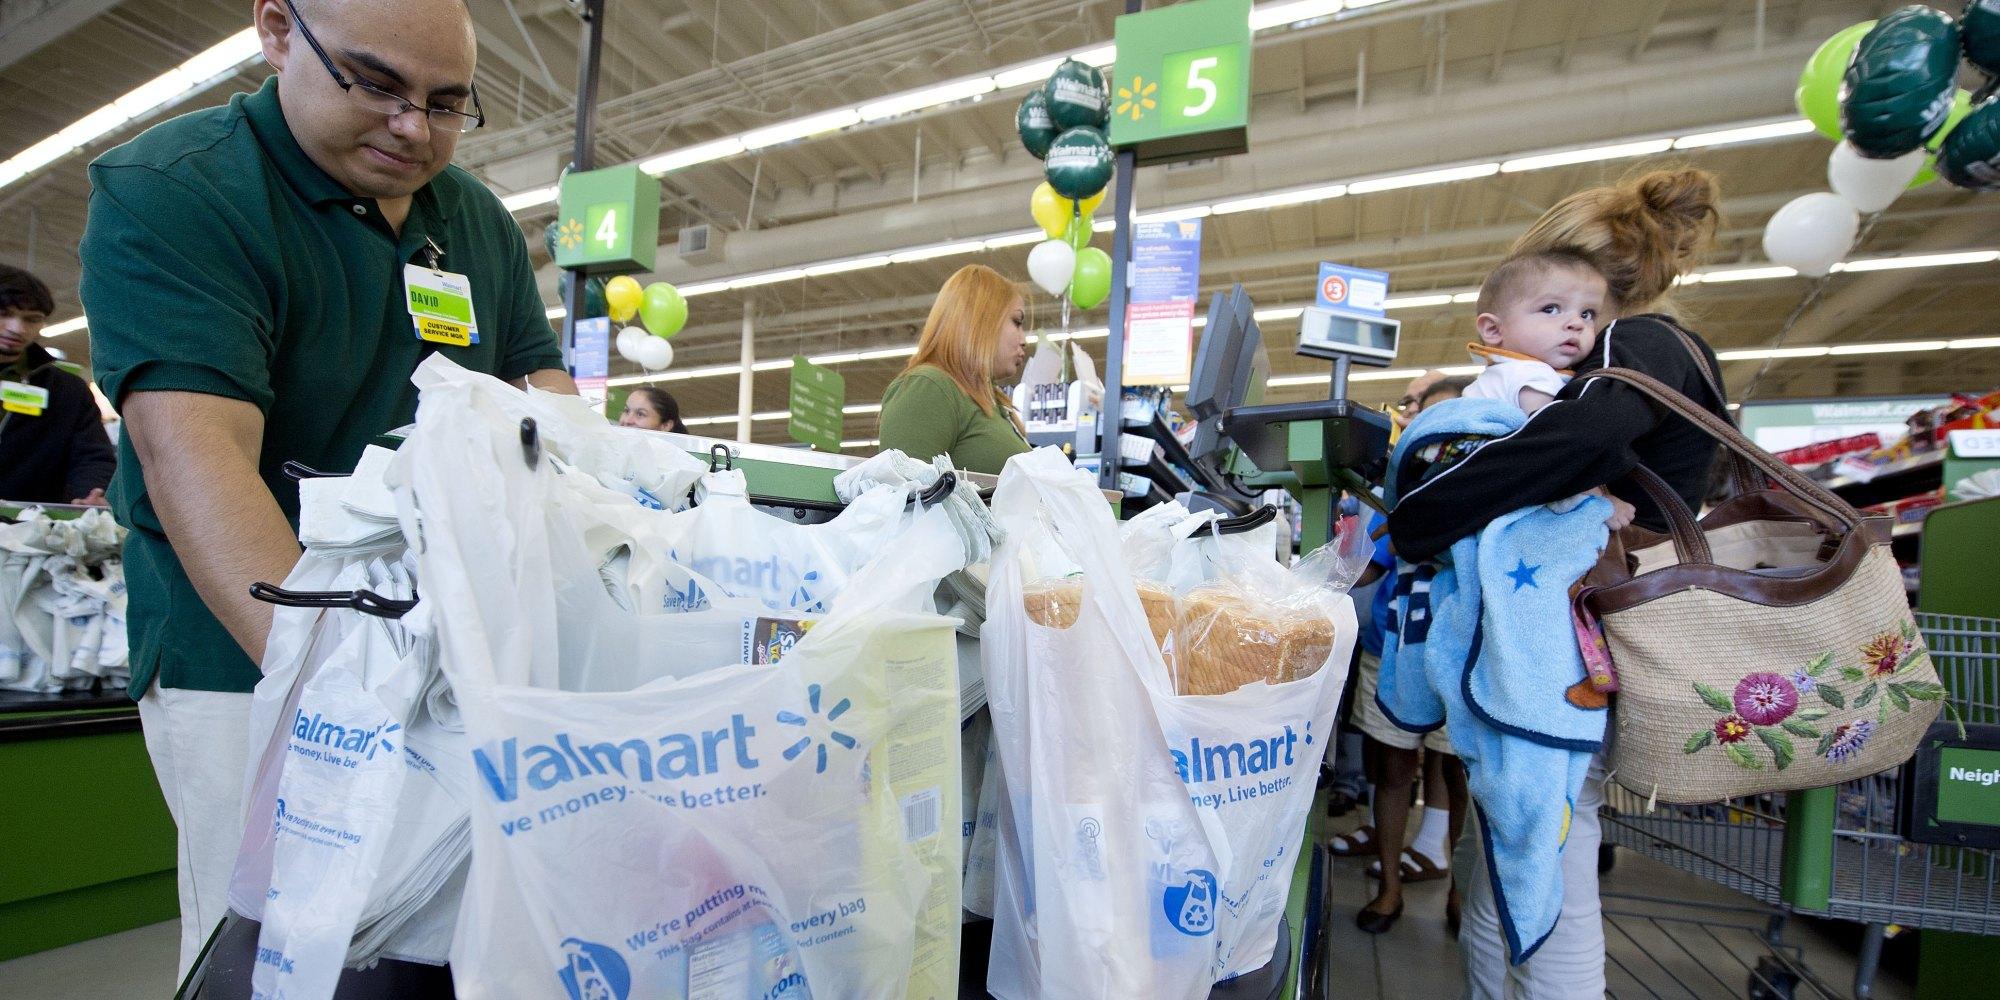 Plastic bag ban chicago - Plastic Bag Ban Chicago 16